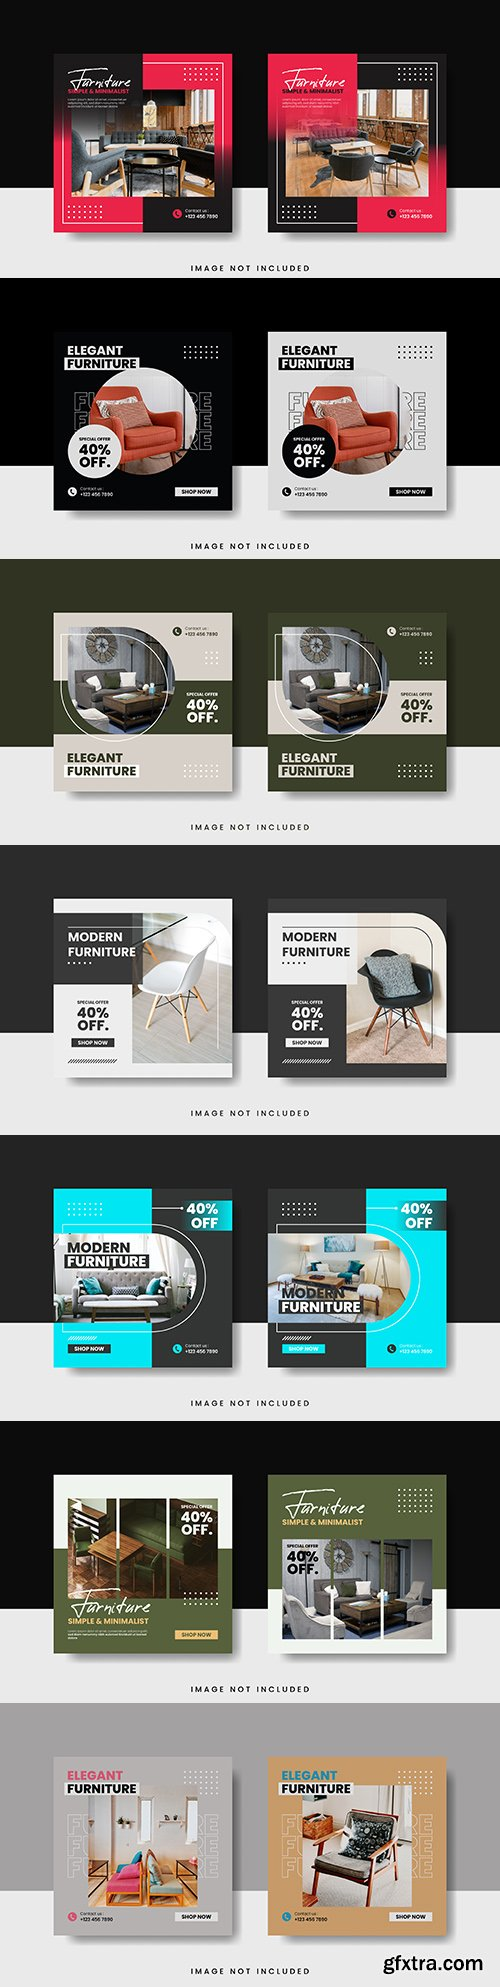 Elegant furniture for social media design template